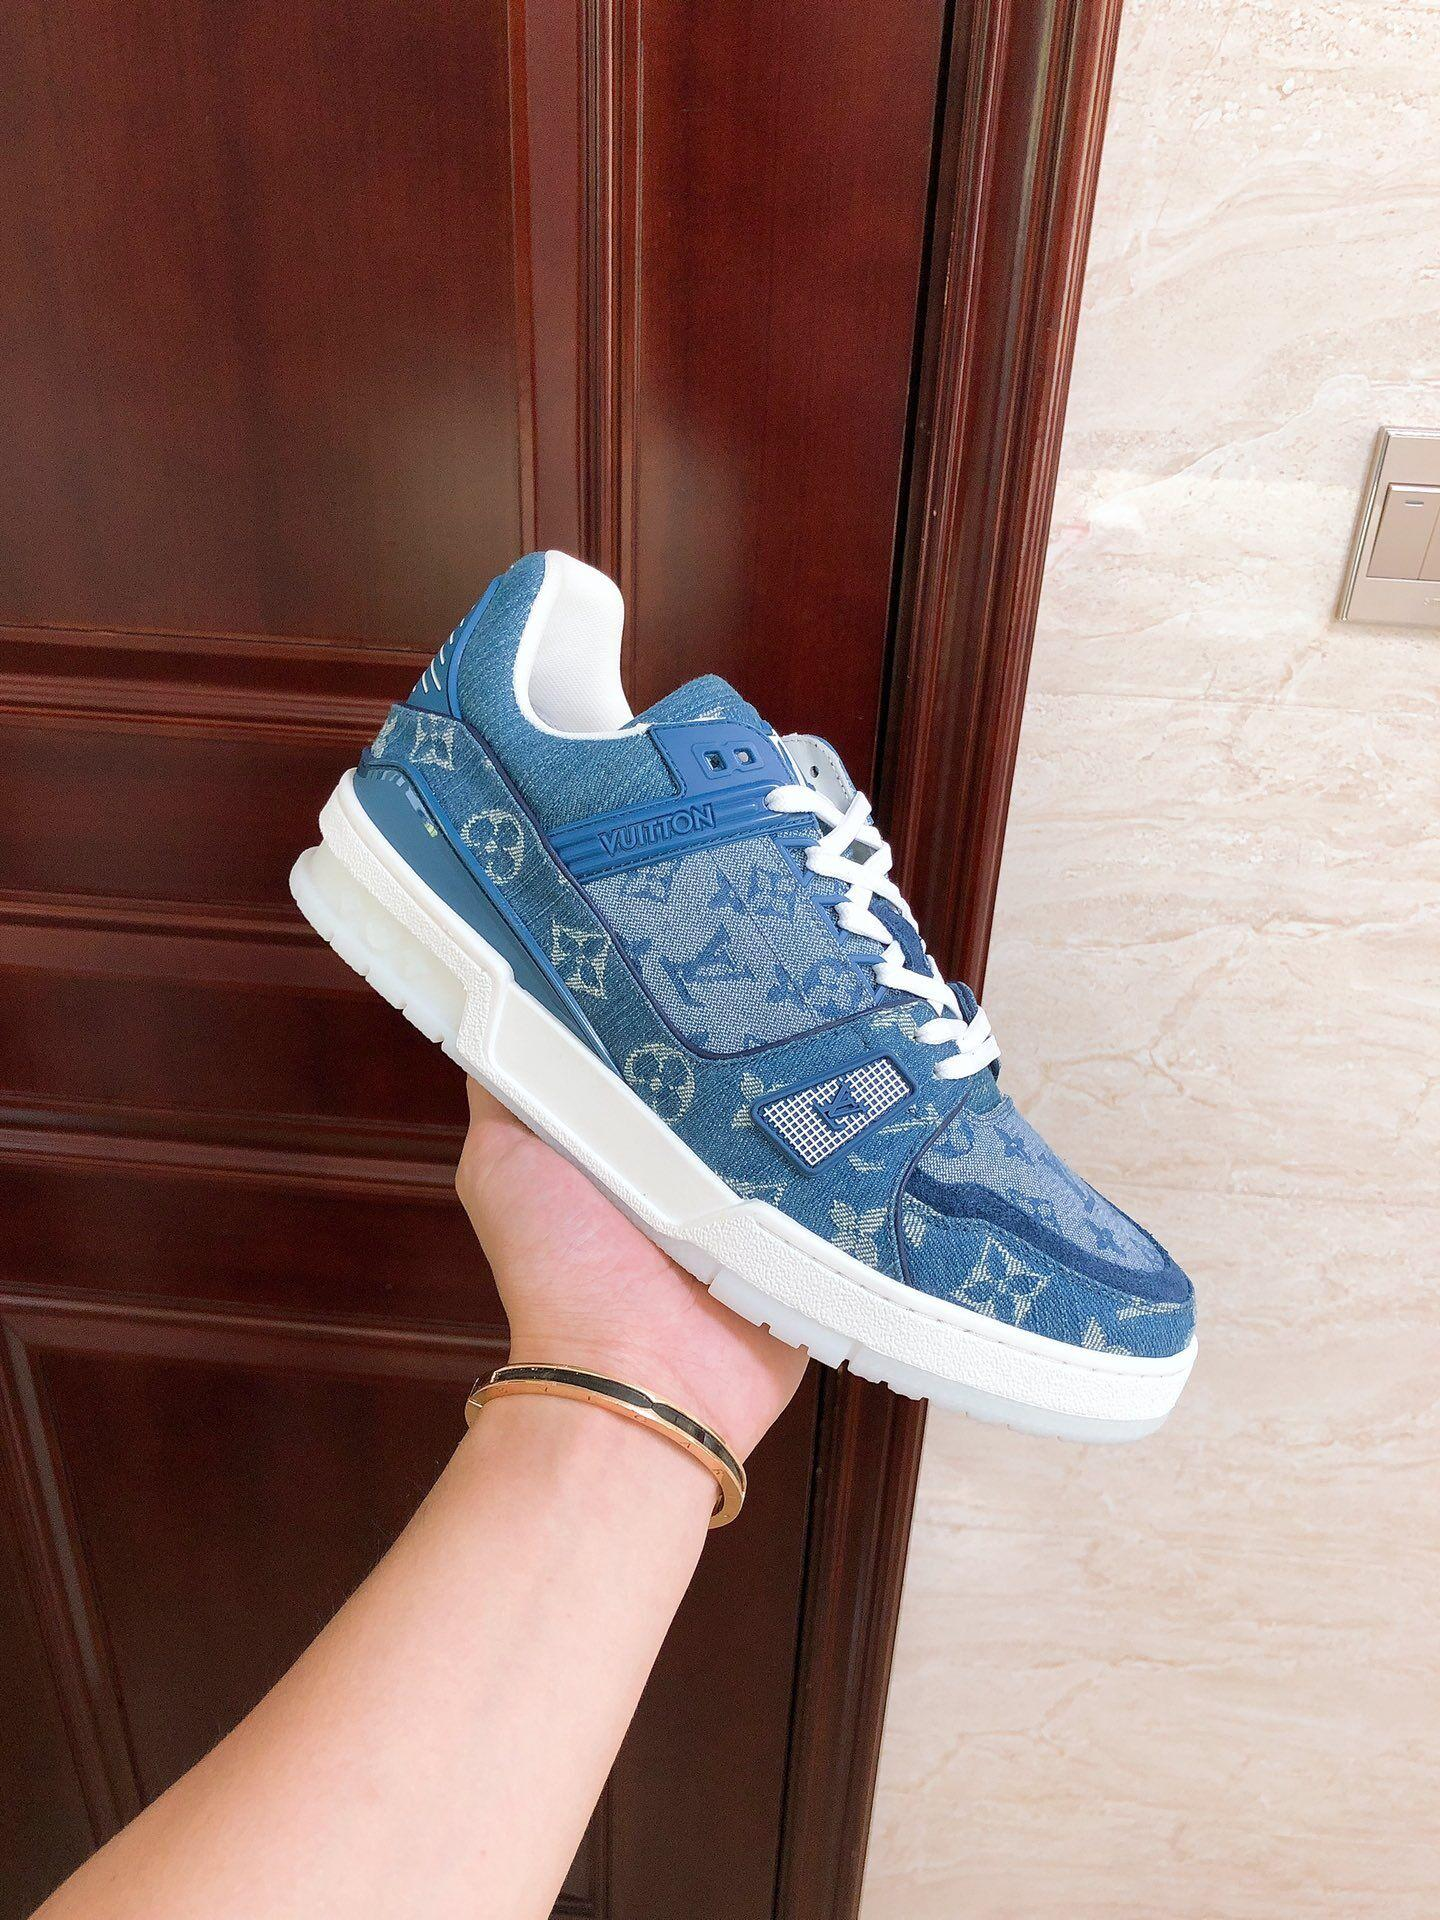 trainer sneaker Blue Monogram denim    sneaker    shoes 1A7S51 8